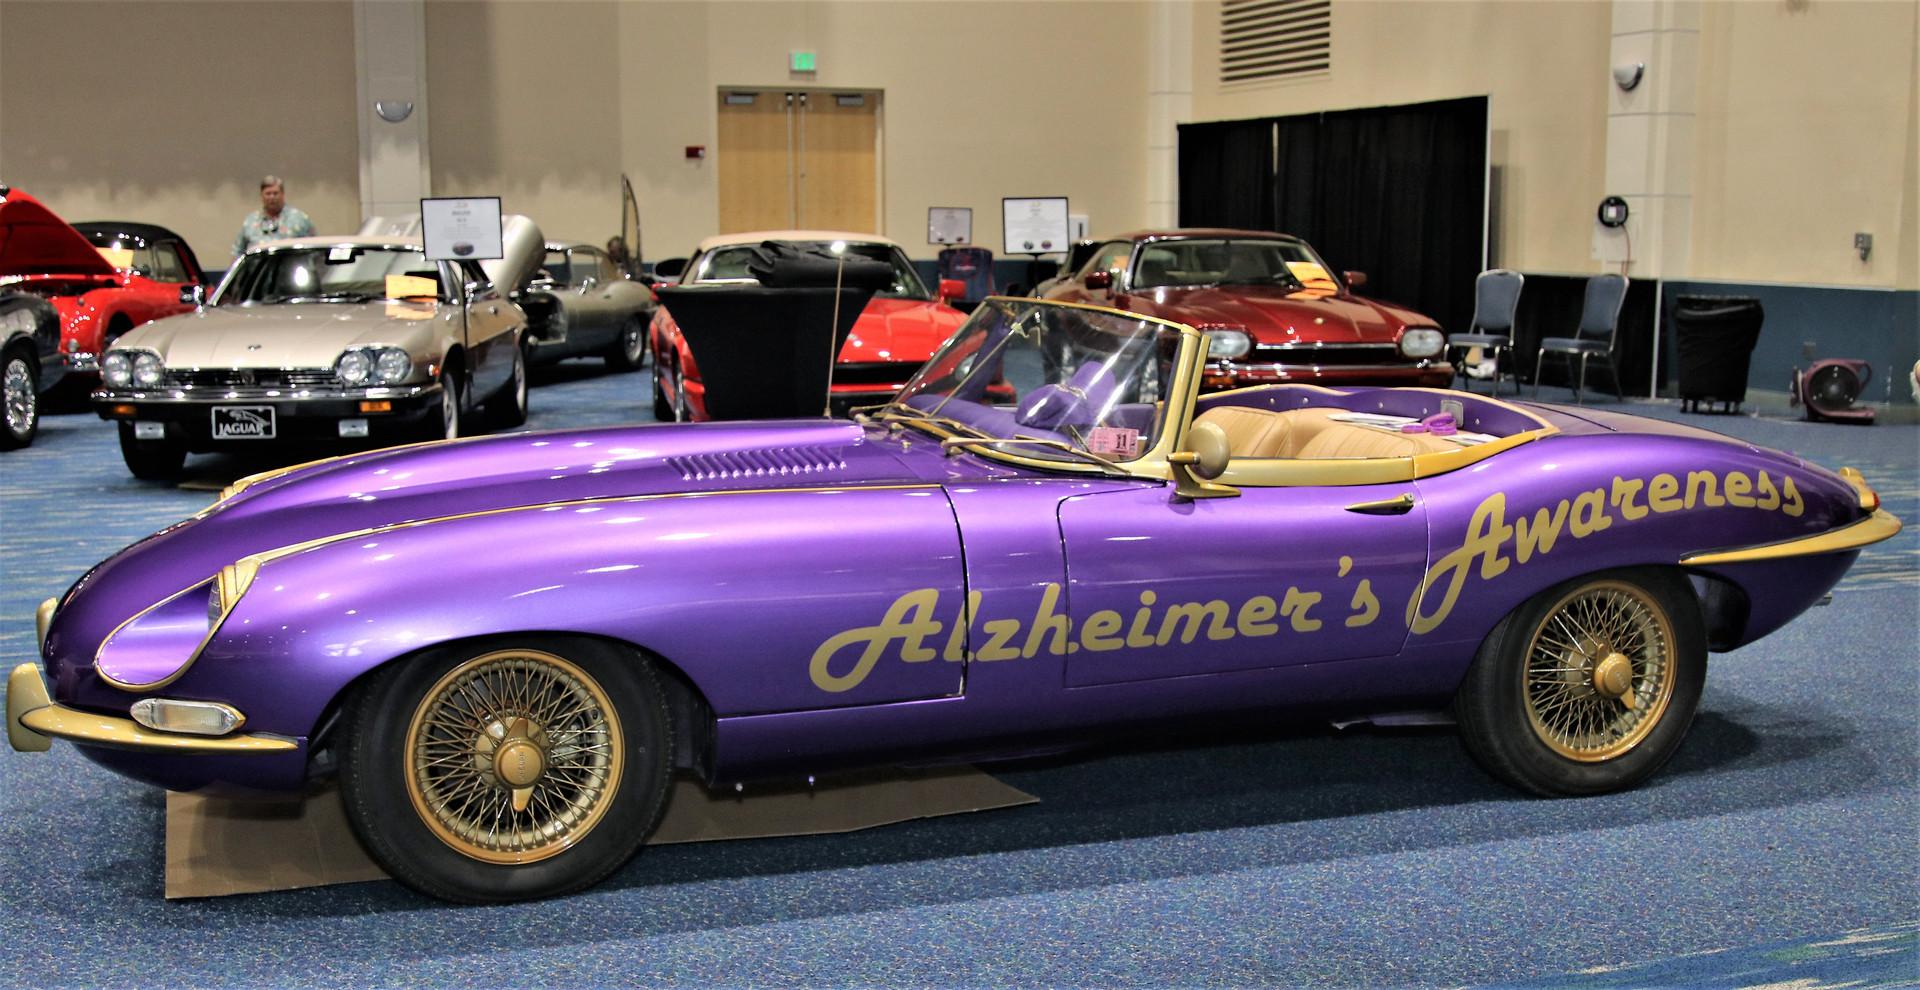 Jaguar of SW FL Car Show_9 (2)